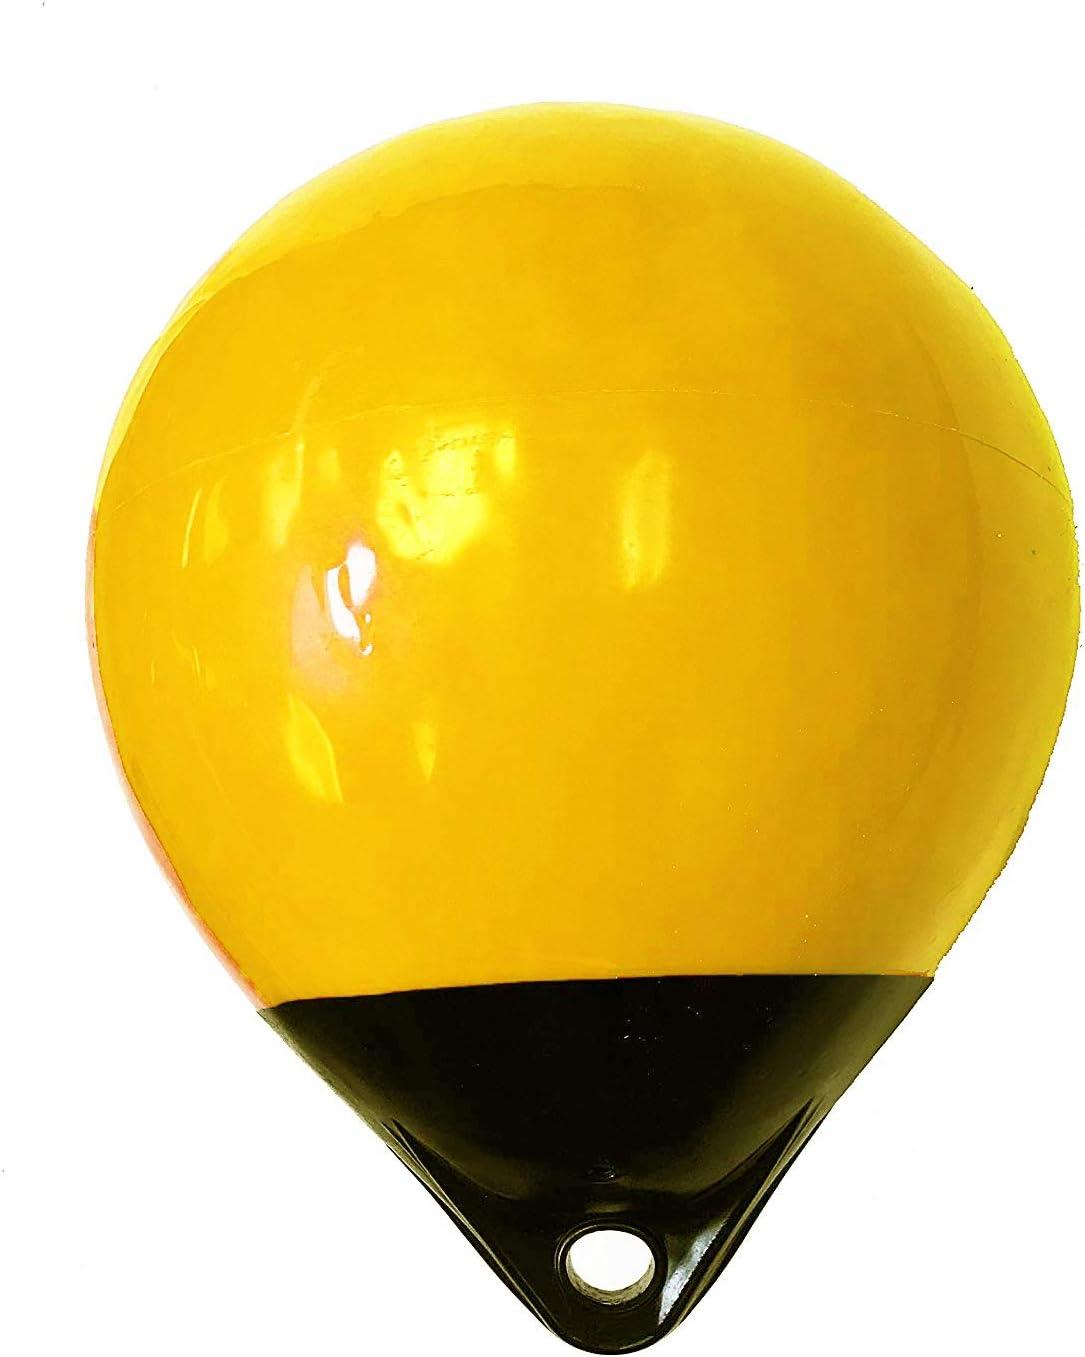 "B07N7VK2JL KUFA Yellow/Black 12 Diameter (inflated Size: 12\"" x 15\"") Mark Buoy Mooring Buoy Anchor Lift Buoy Shrimp Trap Buoy A30Y 6126hmNyUzL"